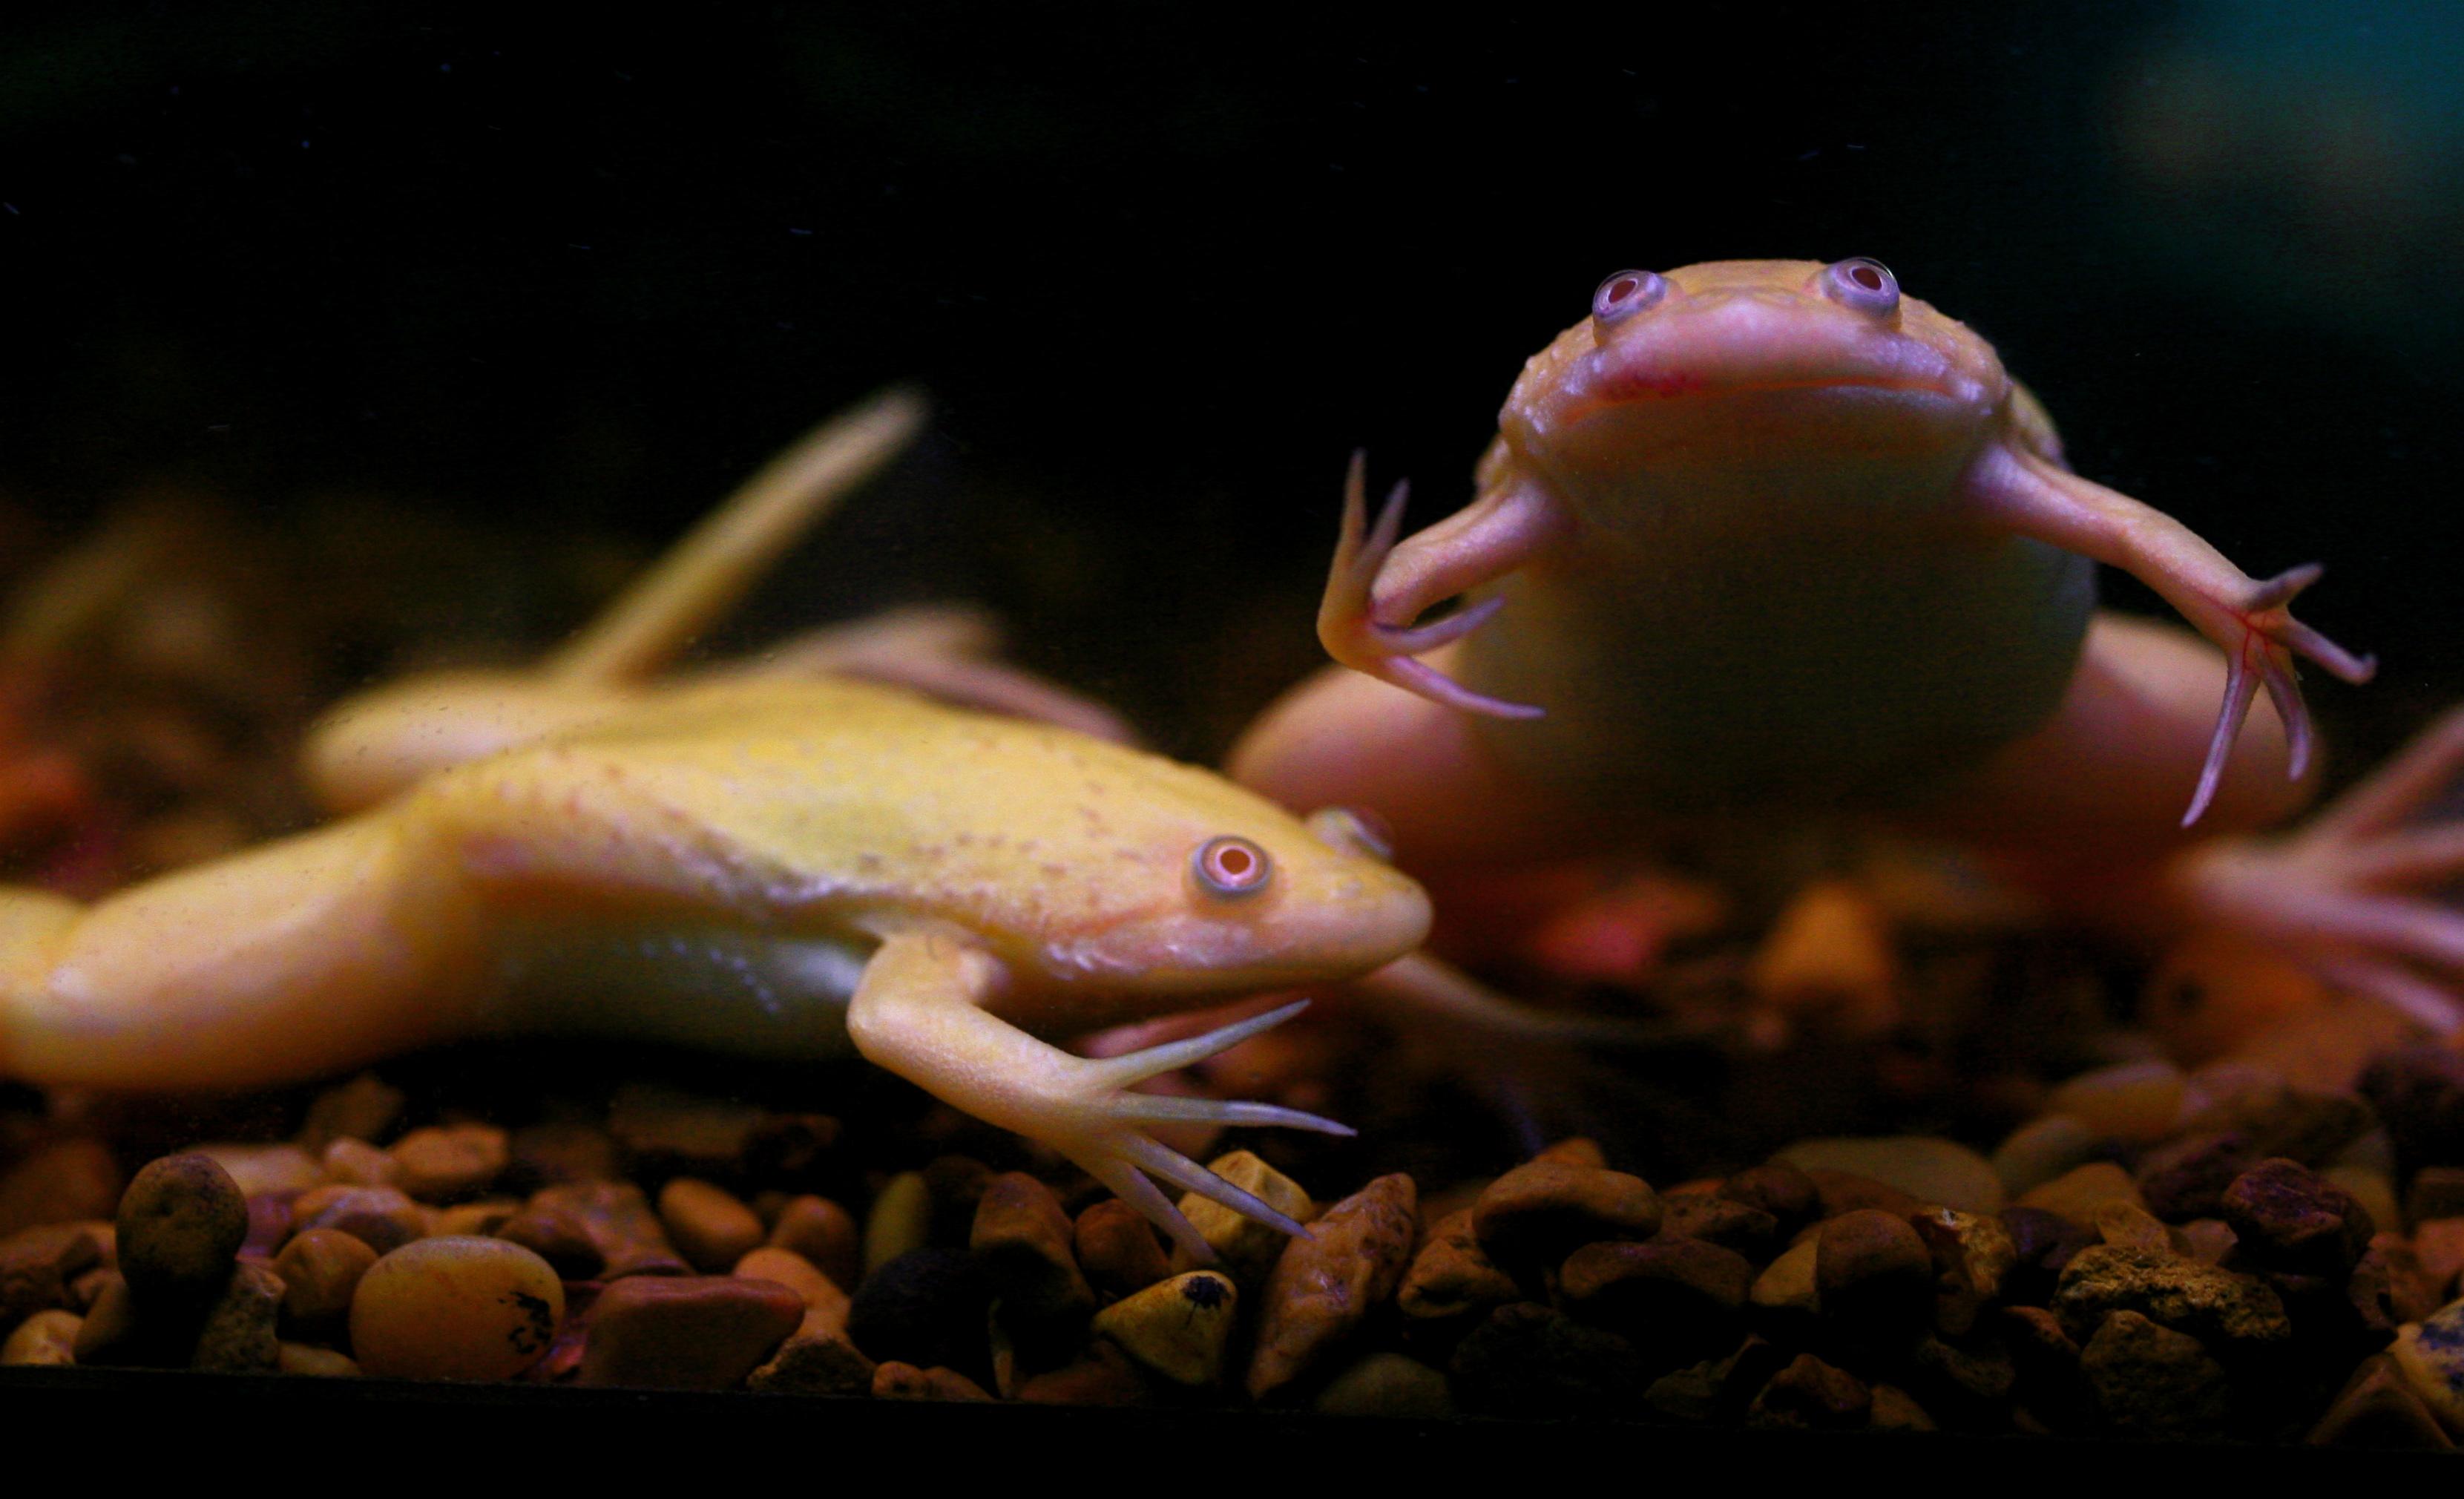 frogs Xenopus laevis jpg Xenopus Laevis Size